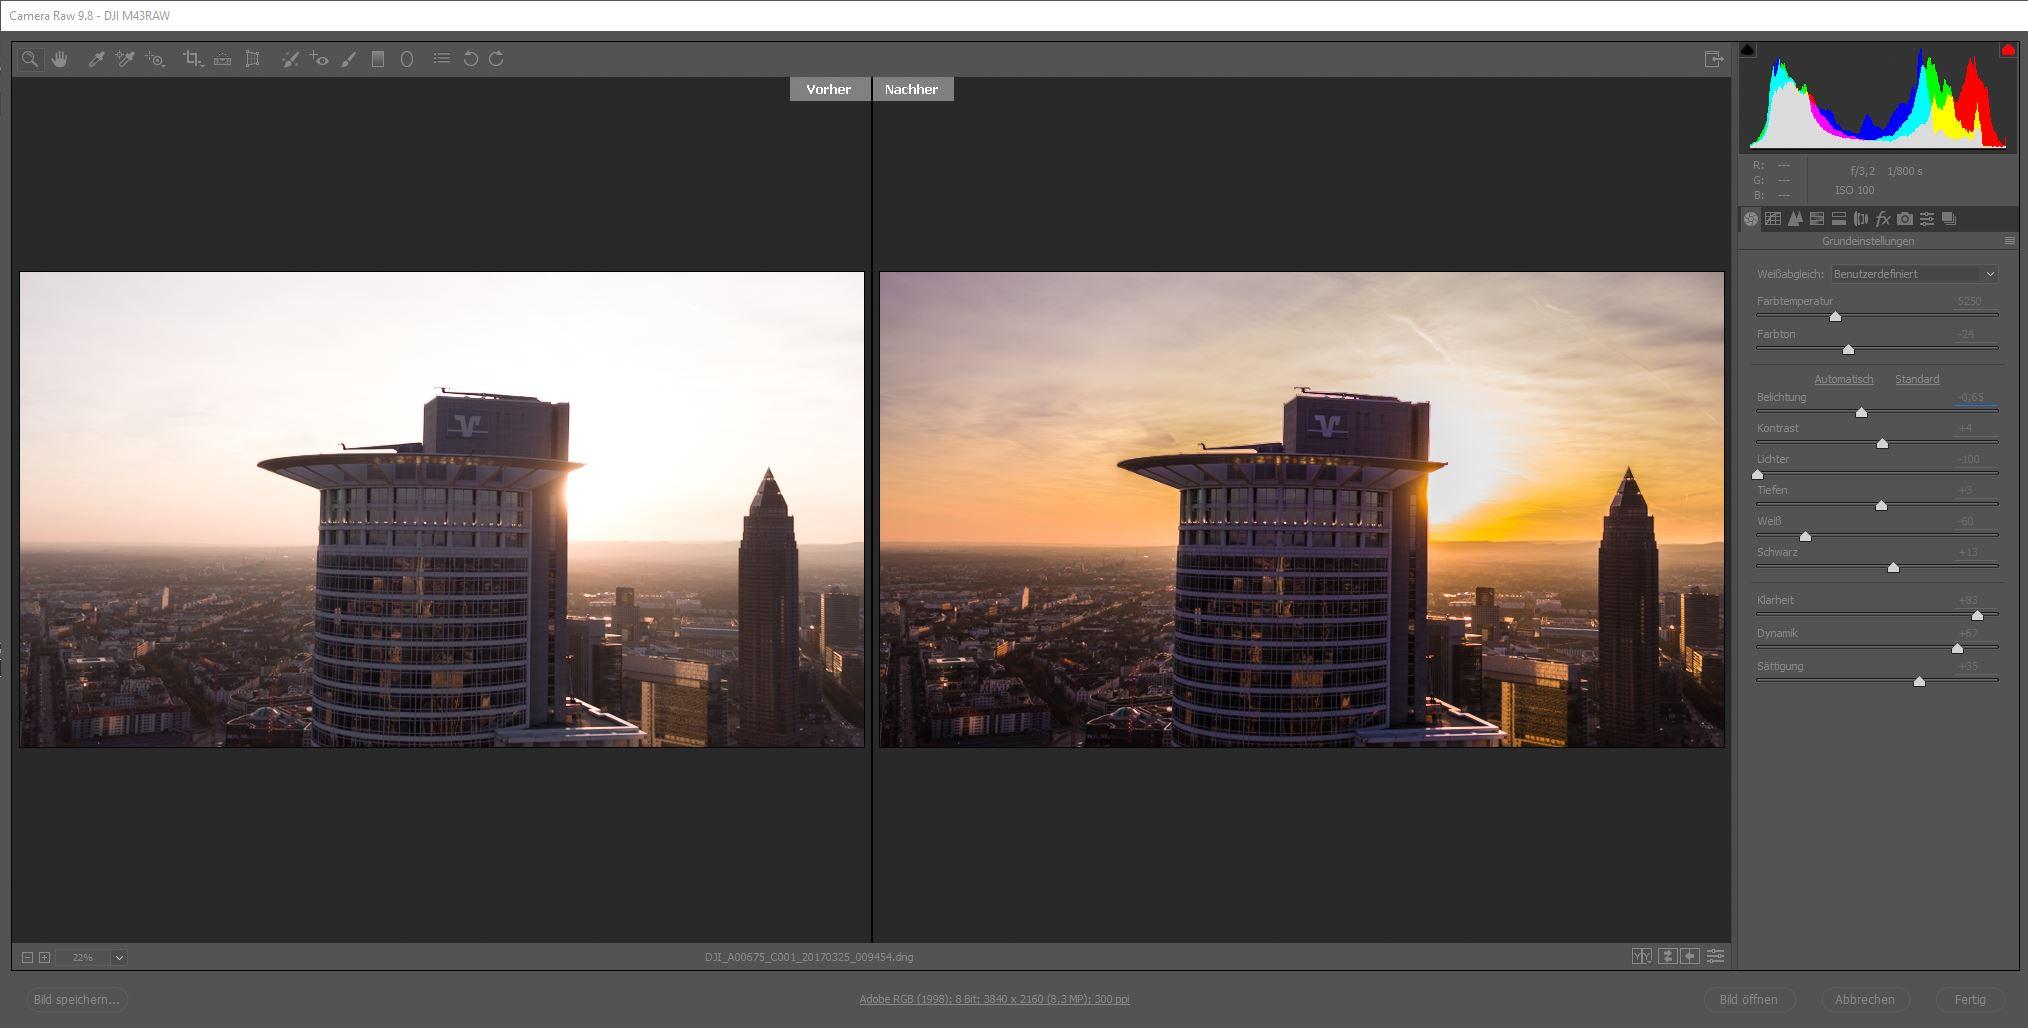 RAW footage Luftaufnahme drohne drone 4k uhd framestorm media skyline frankfurt am main